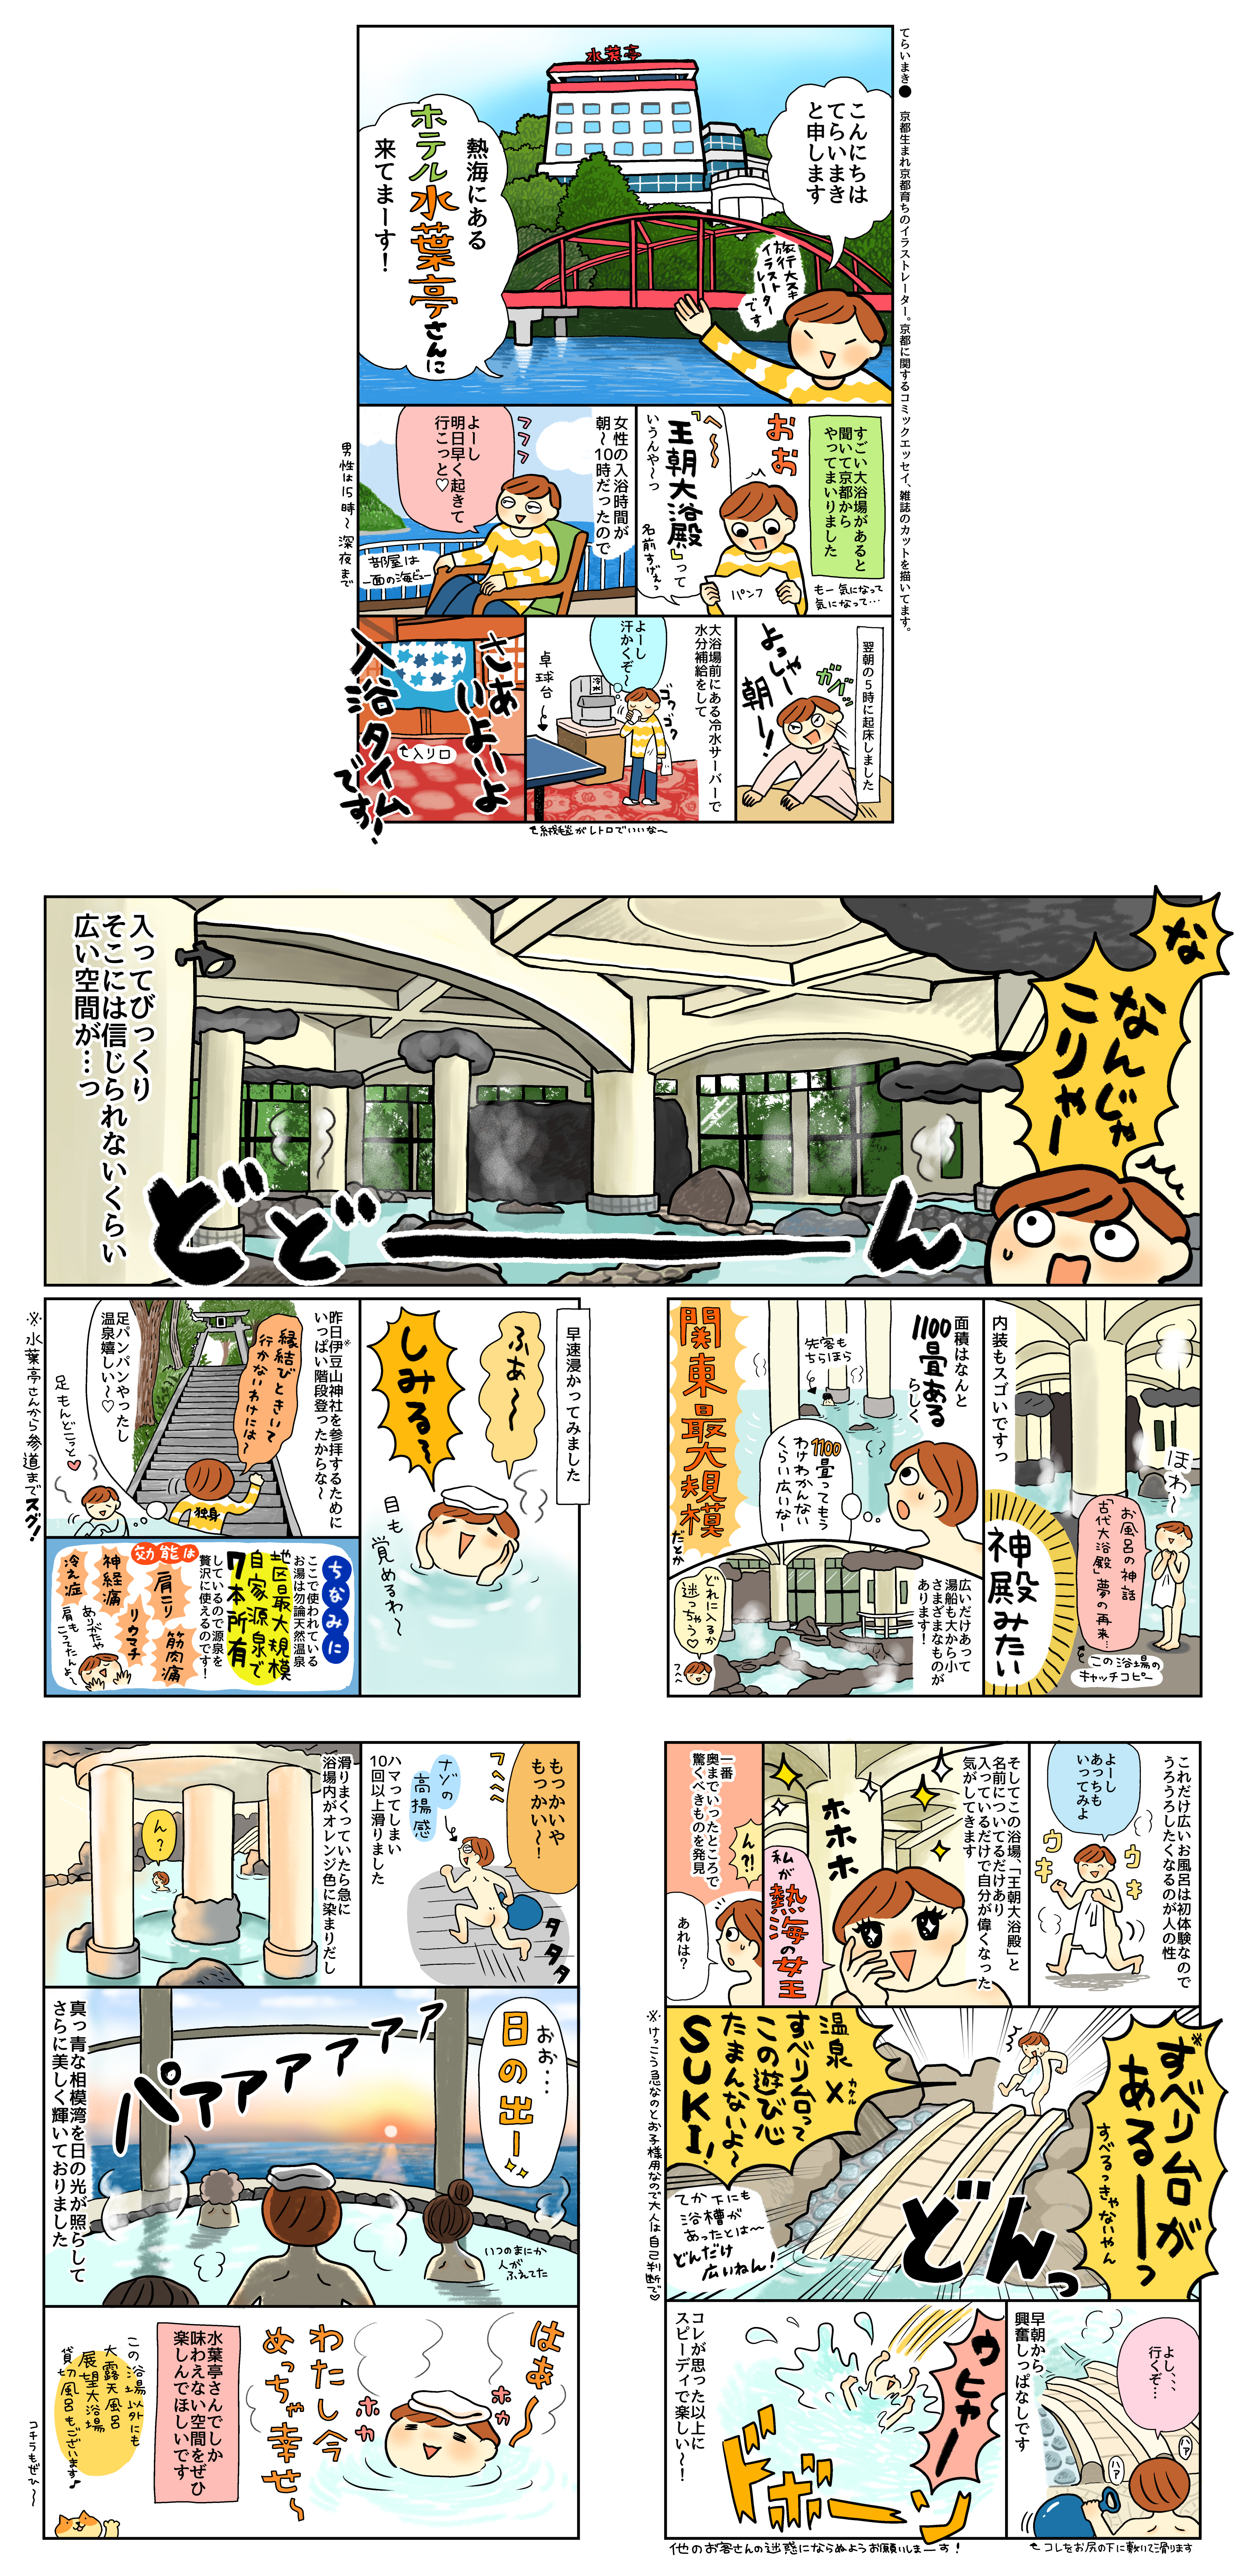 ホテル水葉亭 大浴場紹介漫画